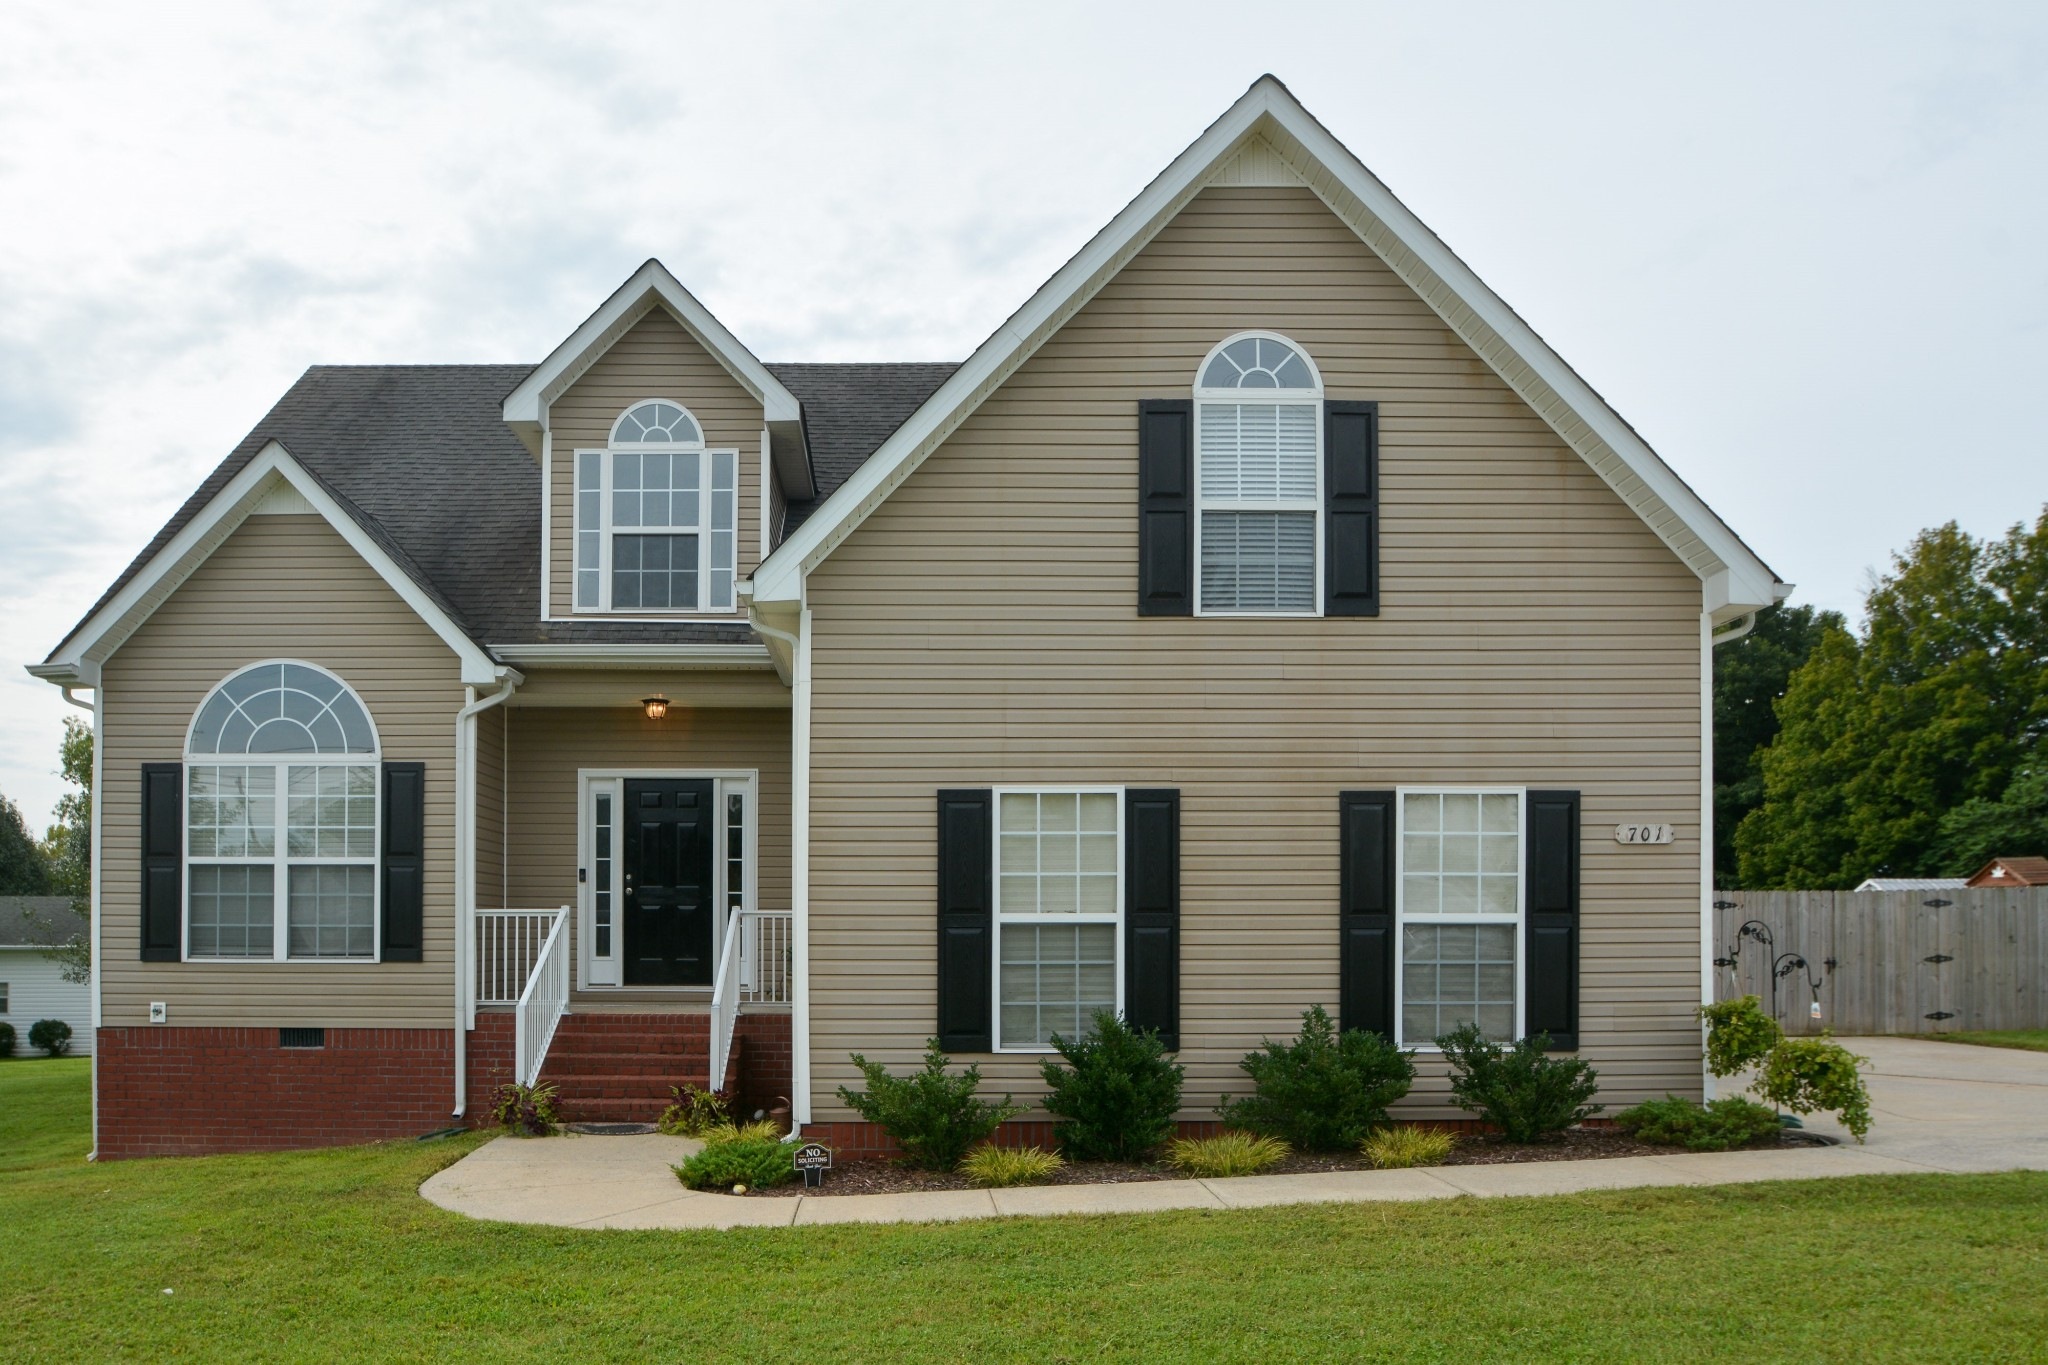 701 Rob Ln Property Photo - Lascassas, TN real estate listing